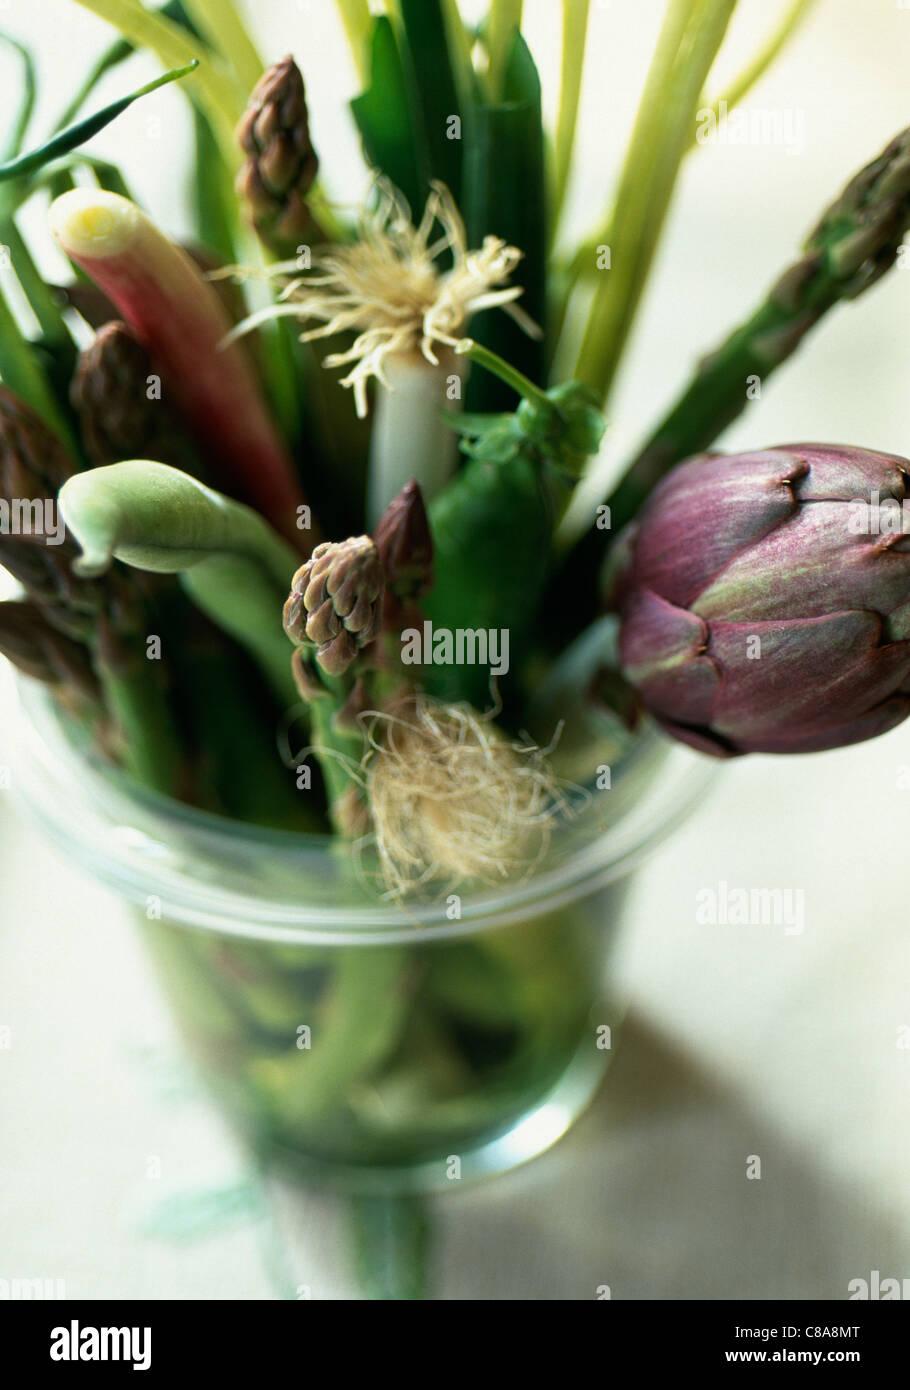 Montón de hortalizas de primavera Imagen De Stock